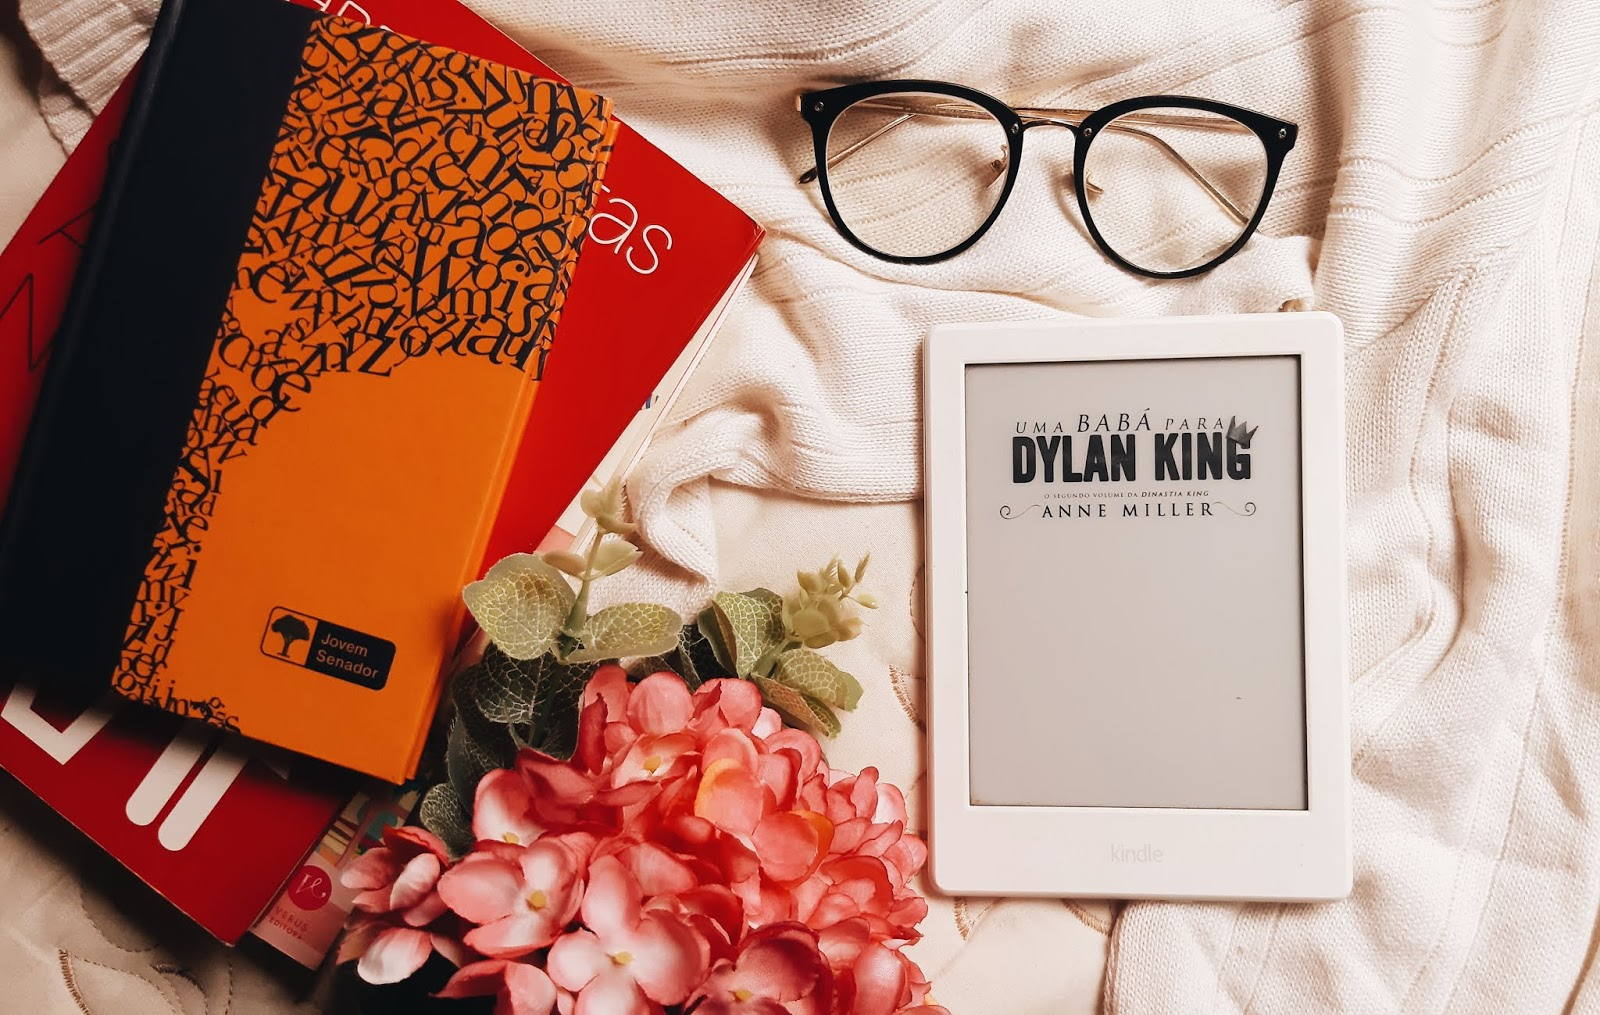 Uma babá para Dylan King - Anne Miller | Resenha